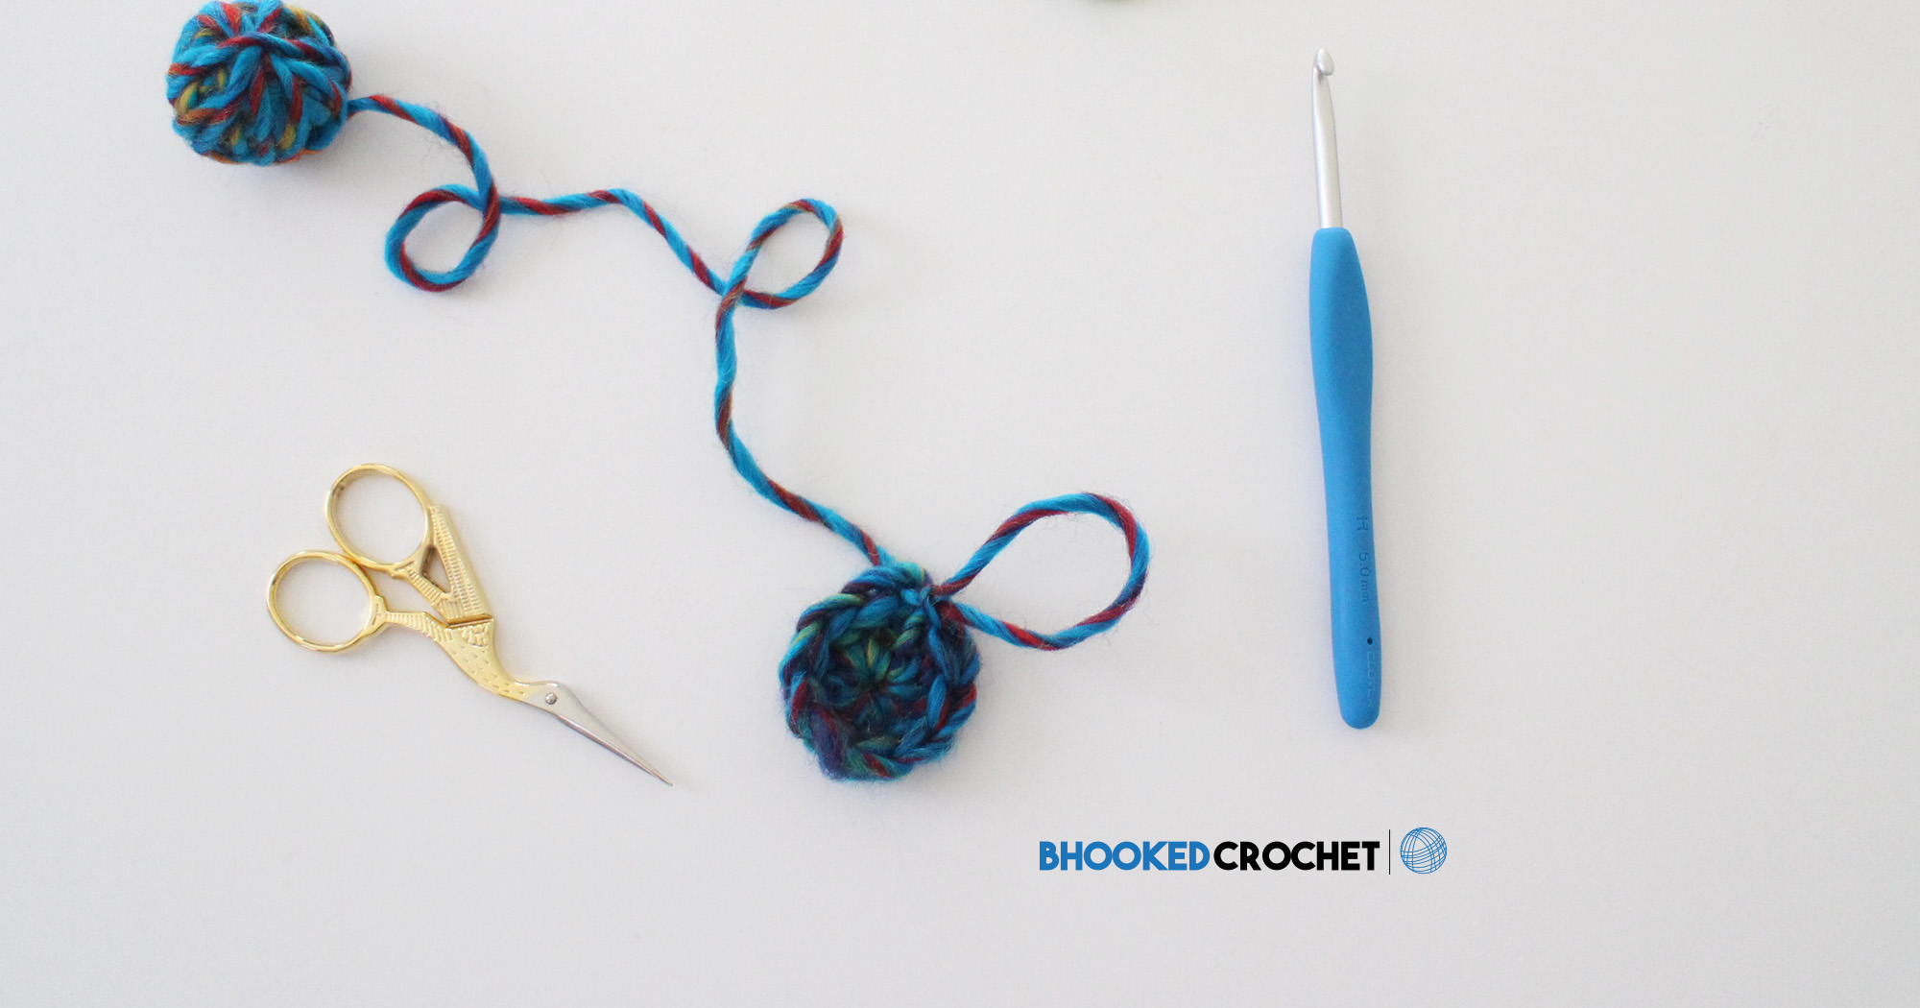 Crochet Magic Ring - Video Tutorial for Three Stitches